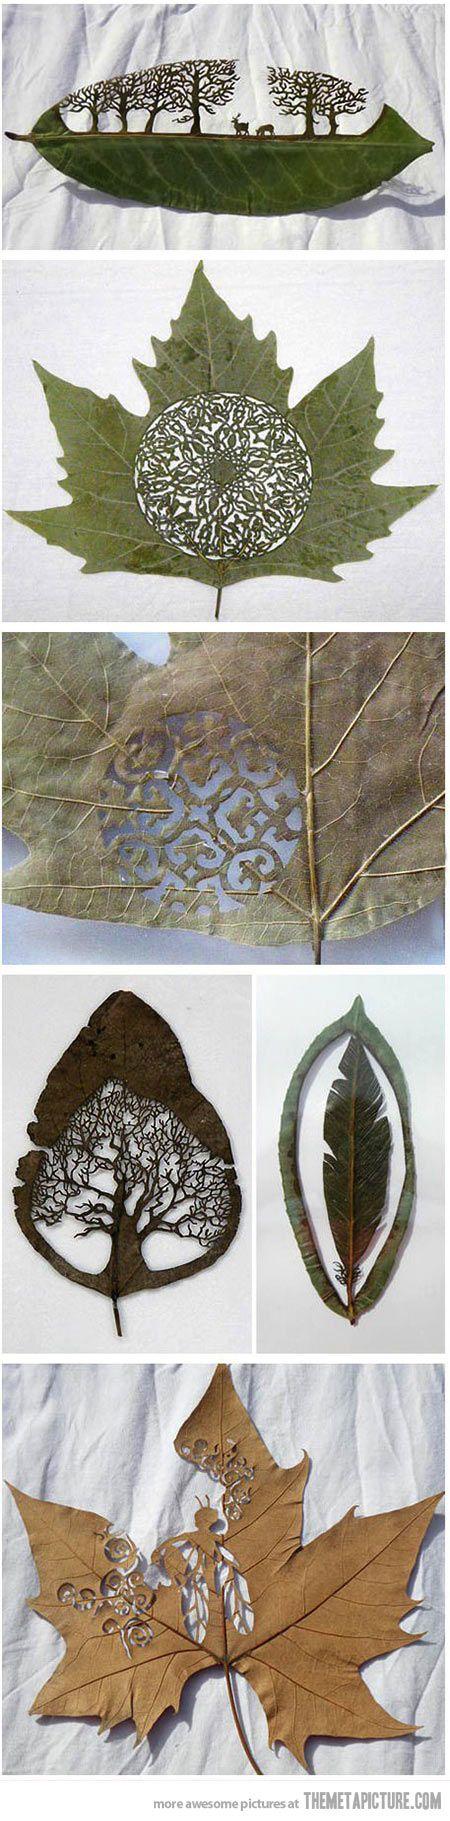 Art in a leaf…